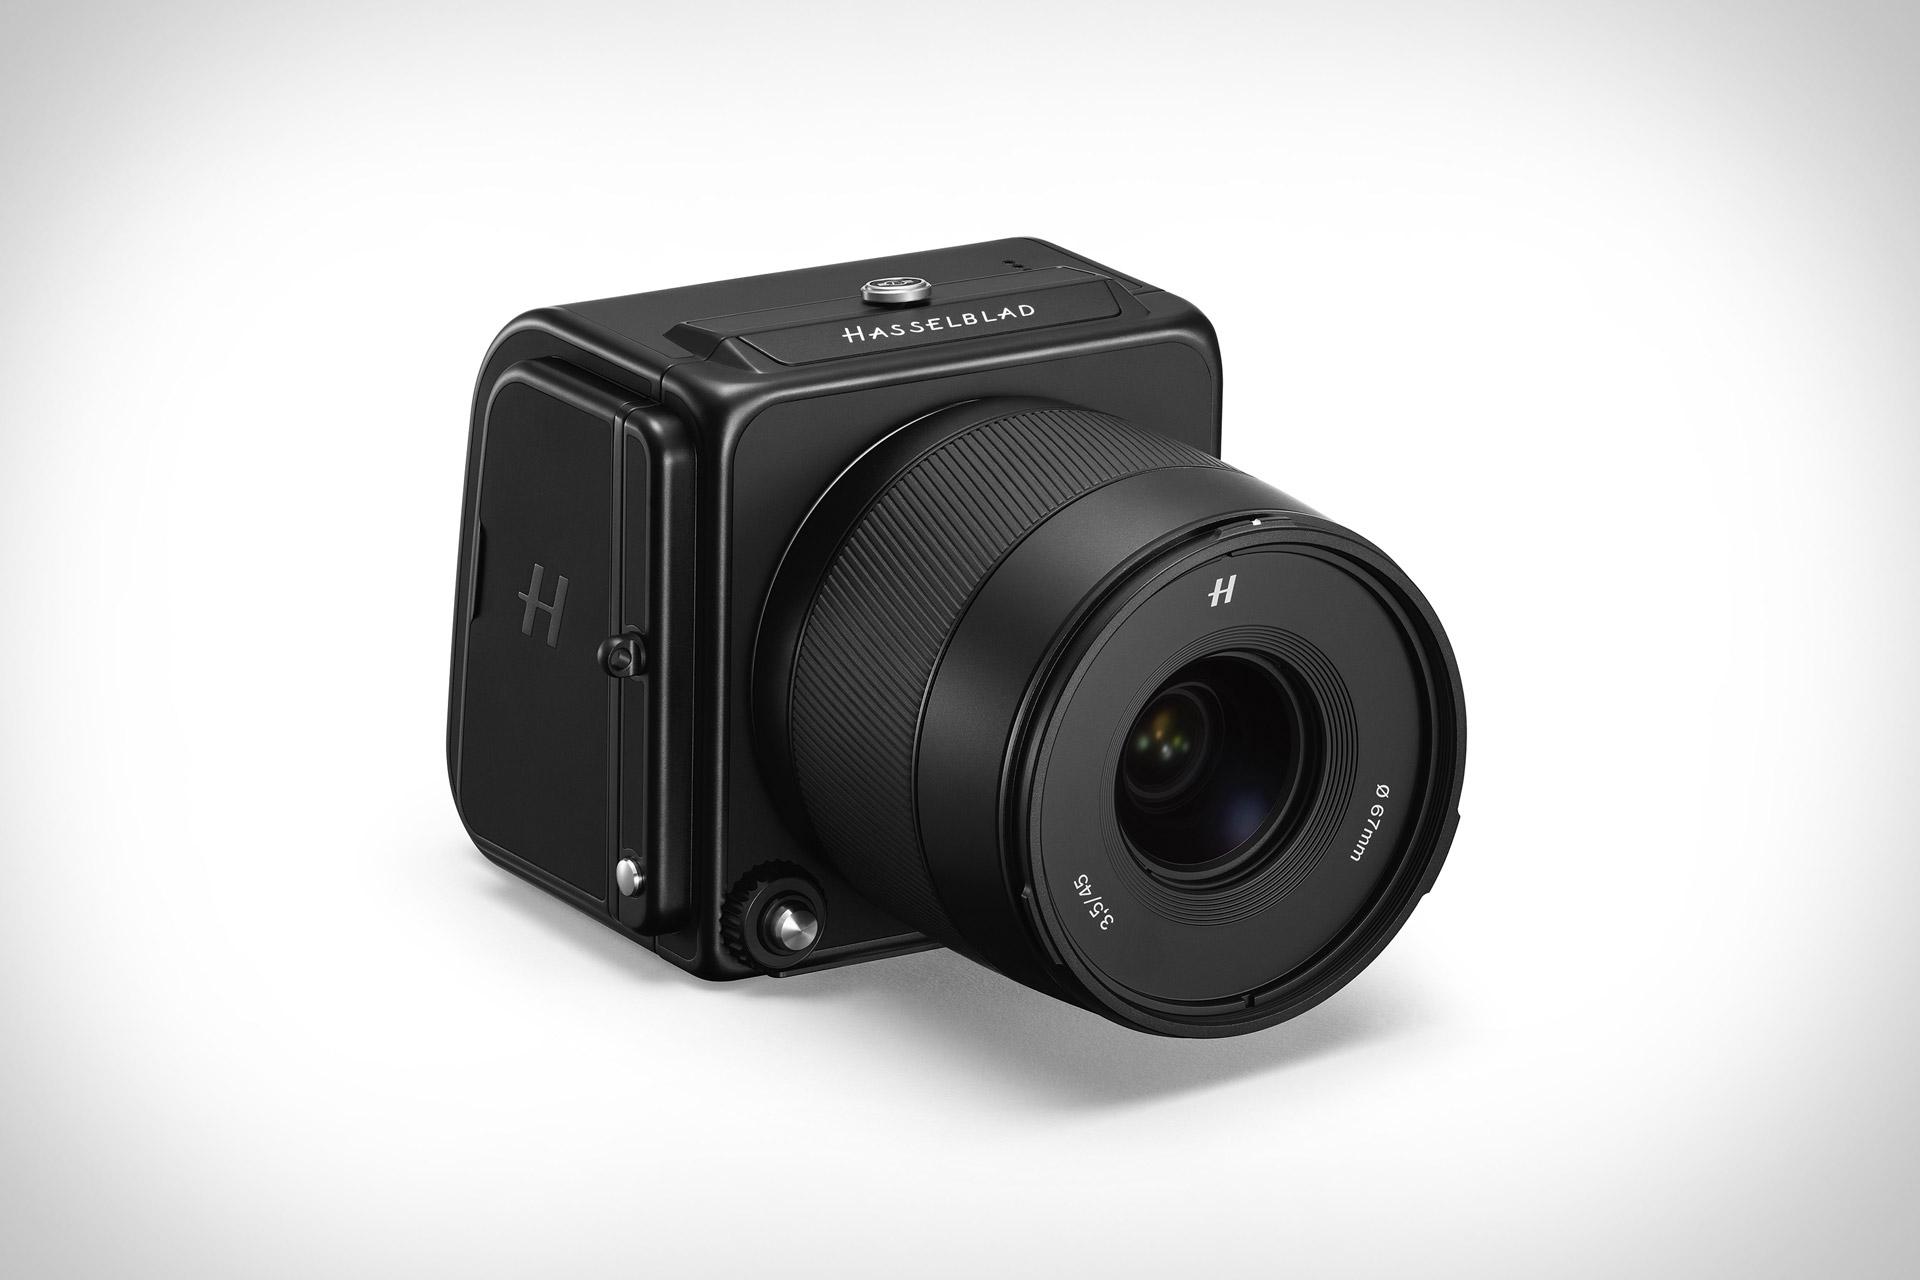 Hasselblad 907X Special Edition Camera